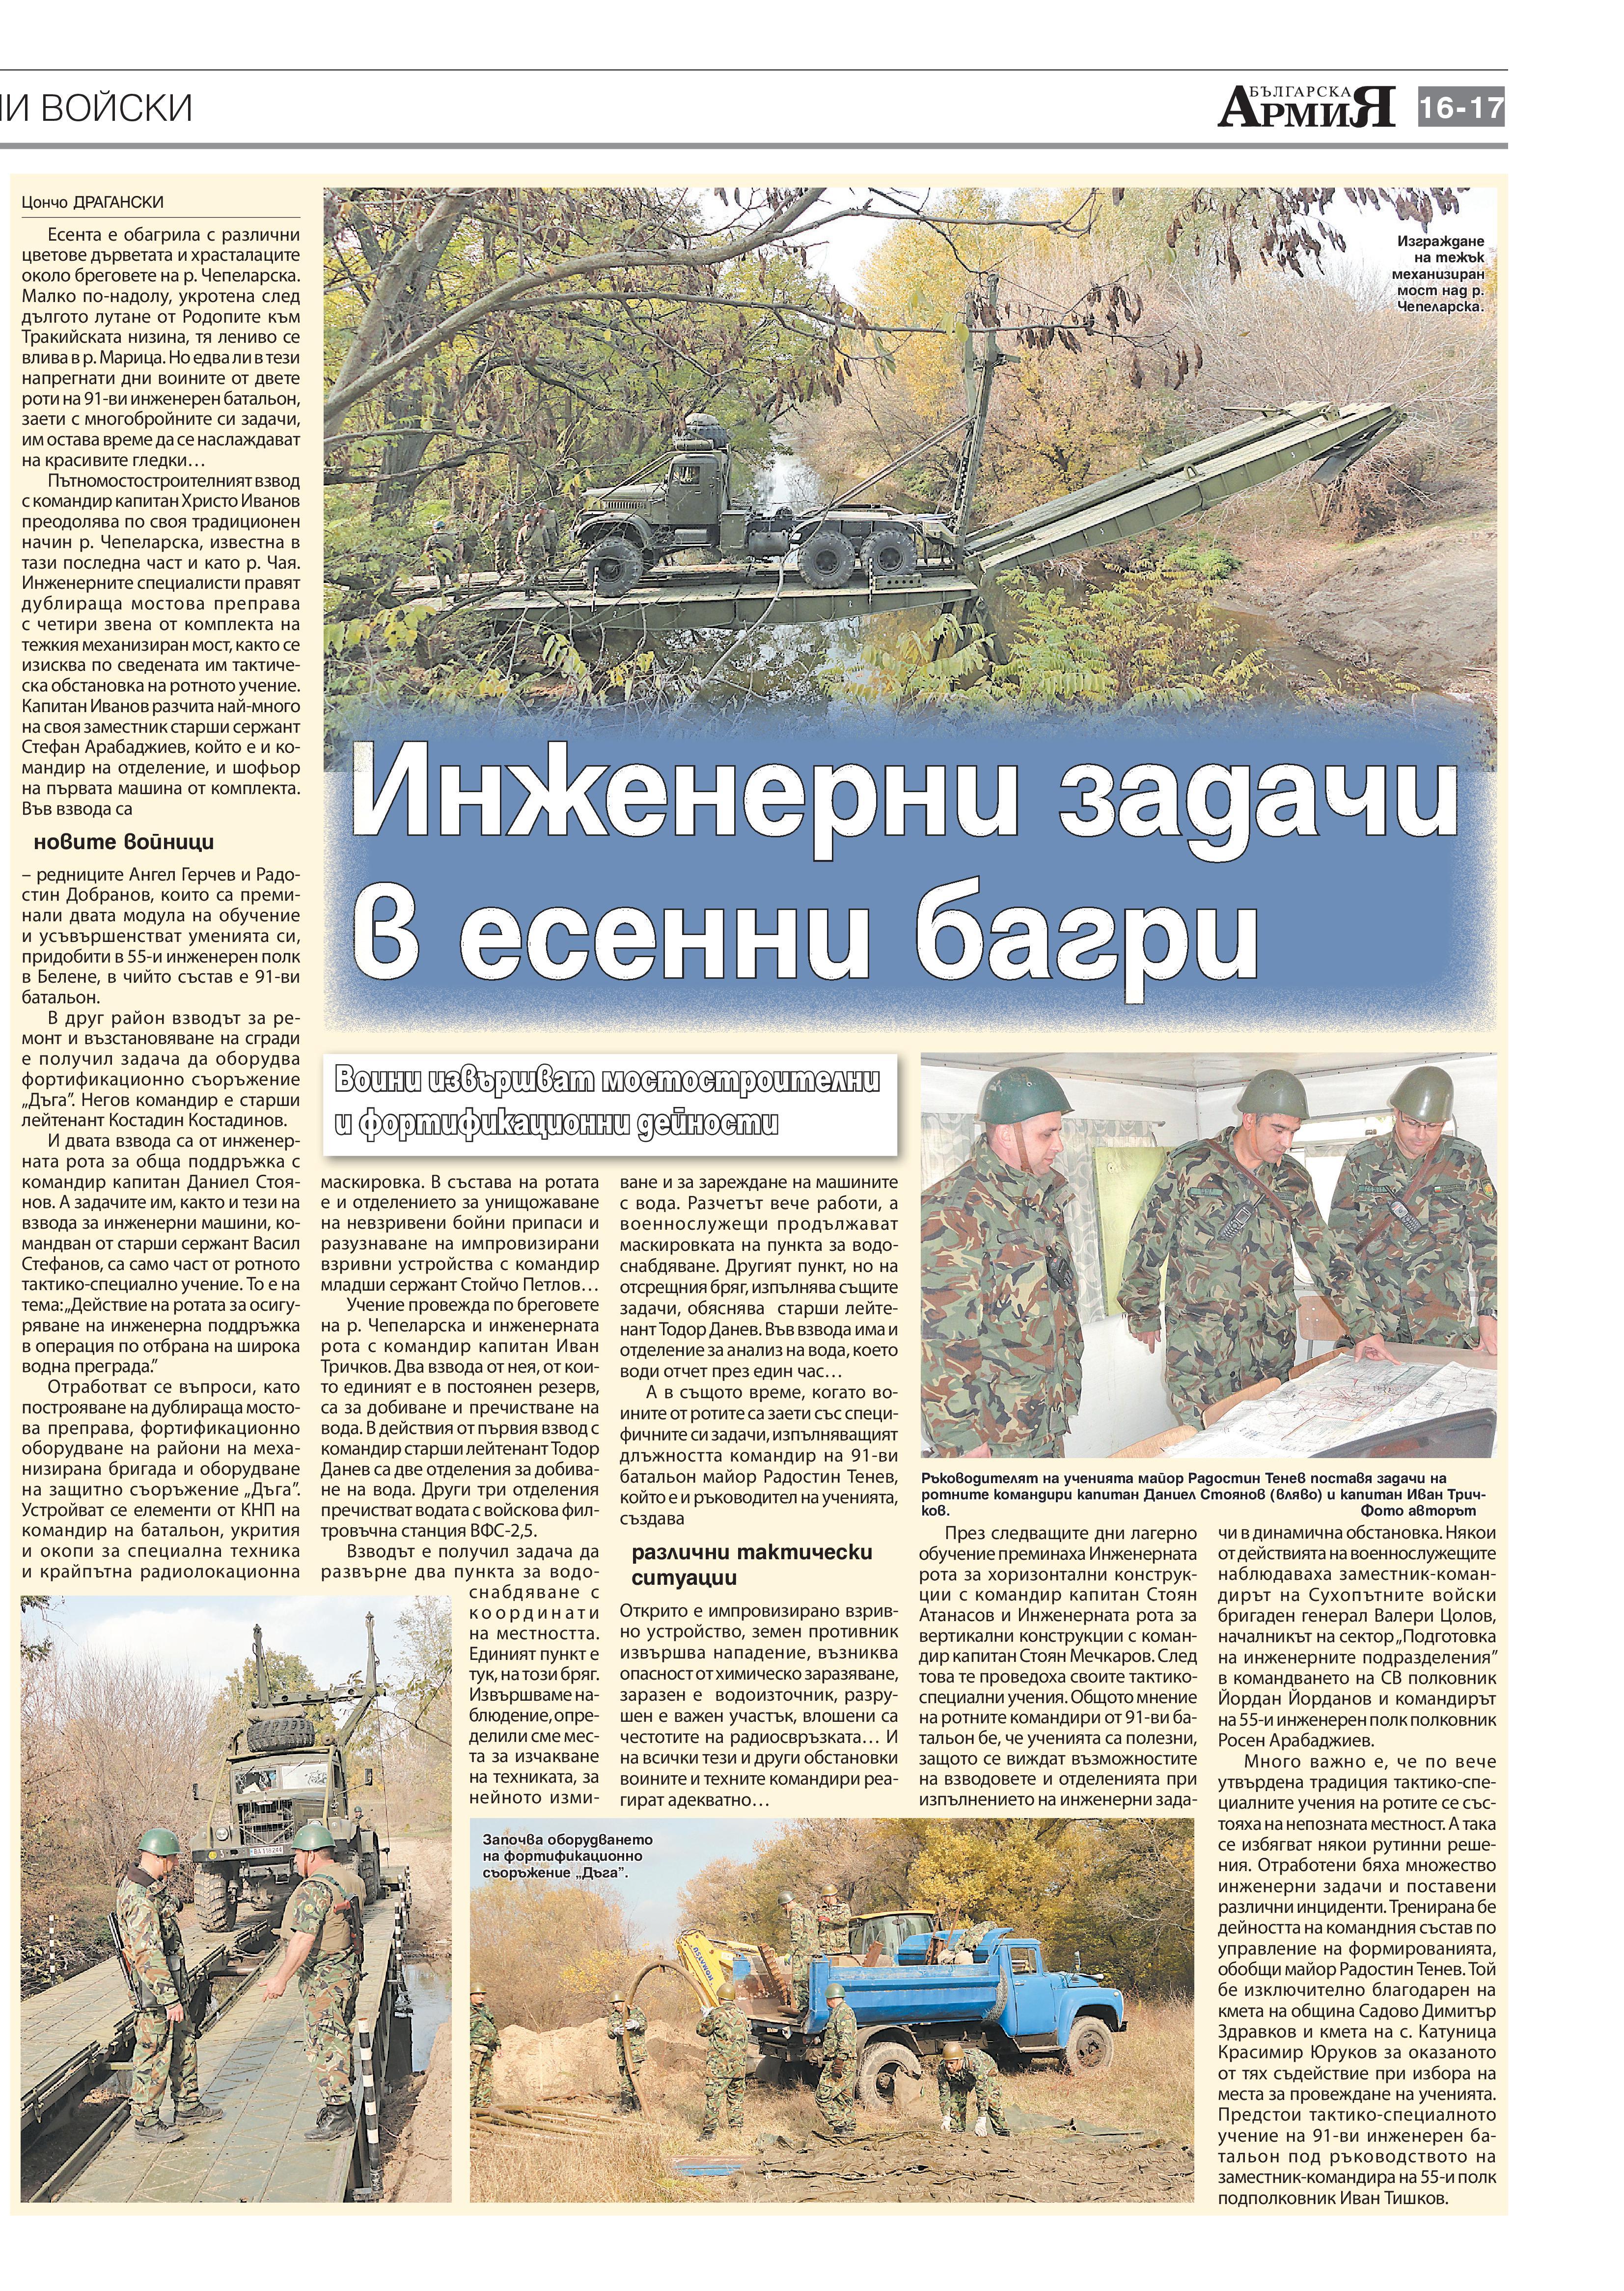 http://armymedia.bg/wp-content/uploads/2015/06/17-12.jpg